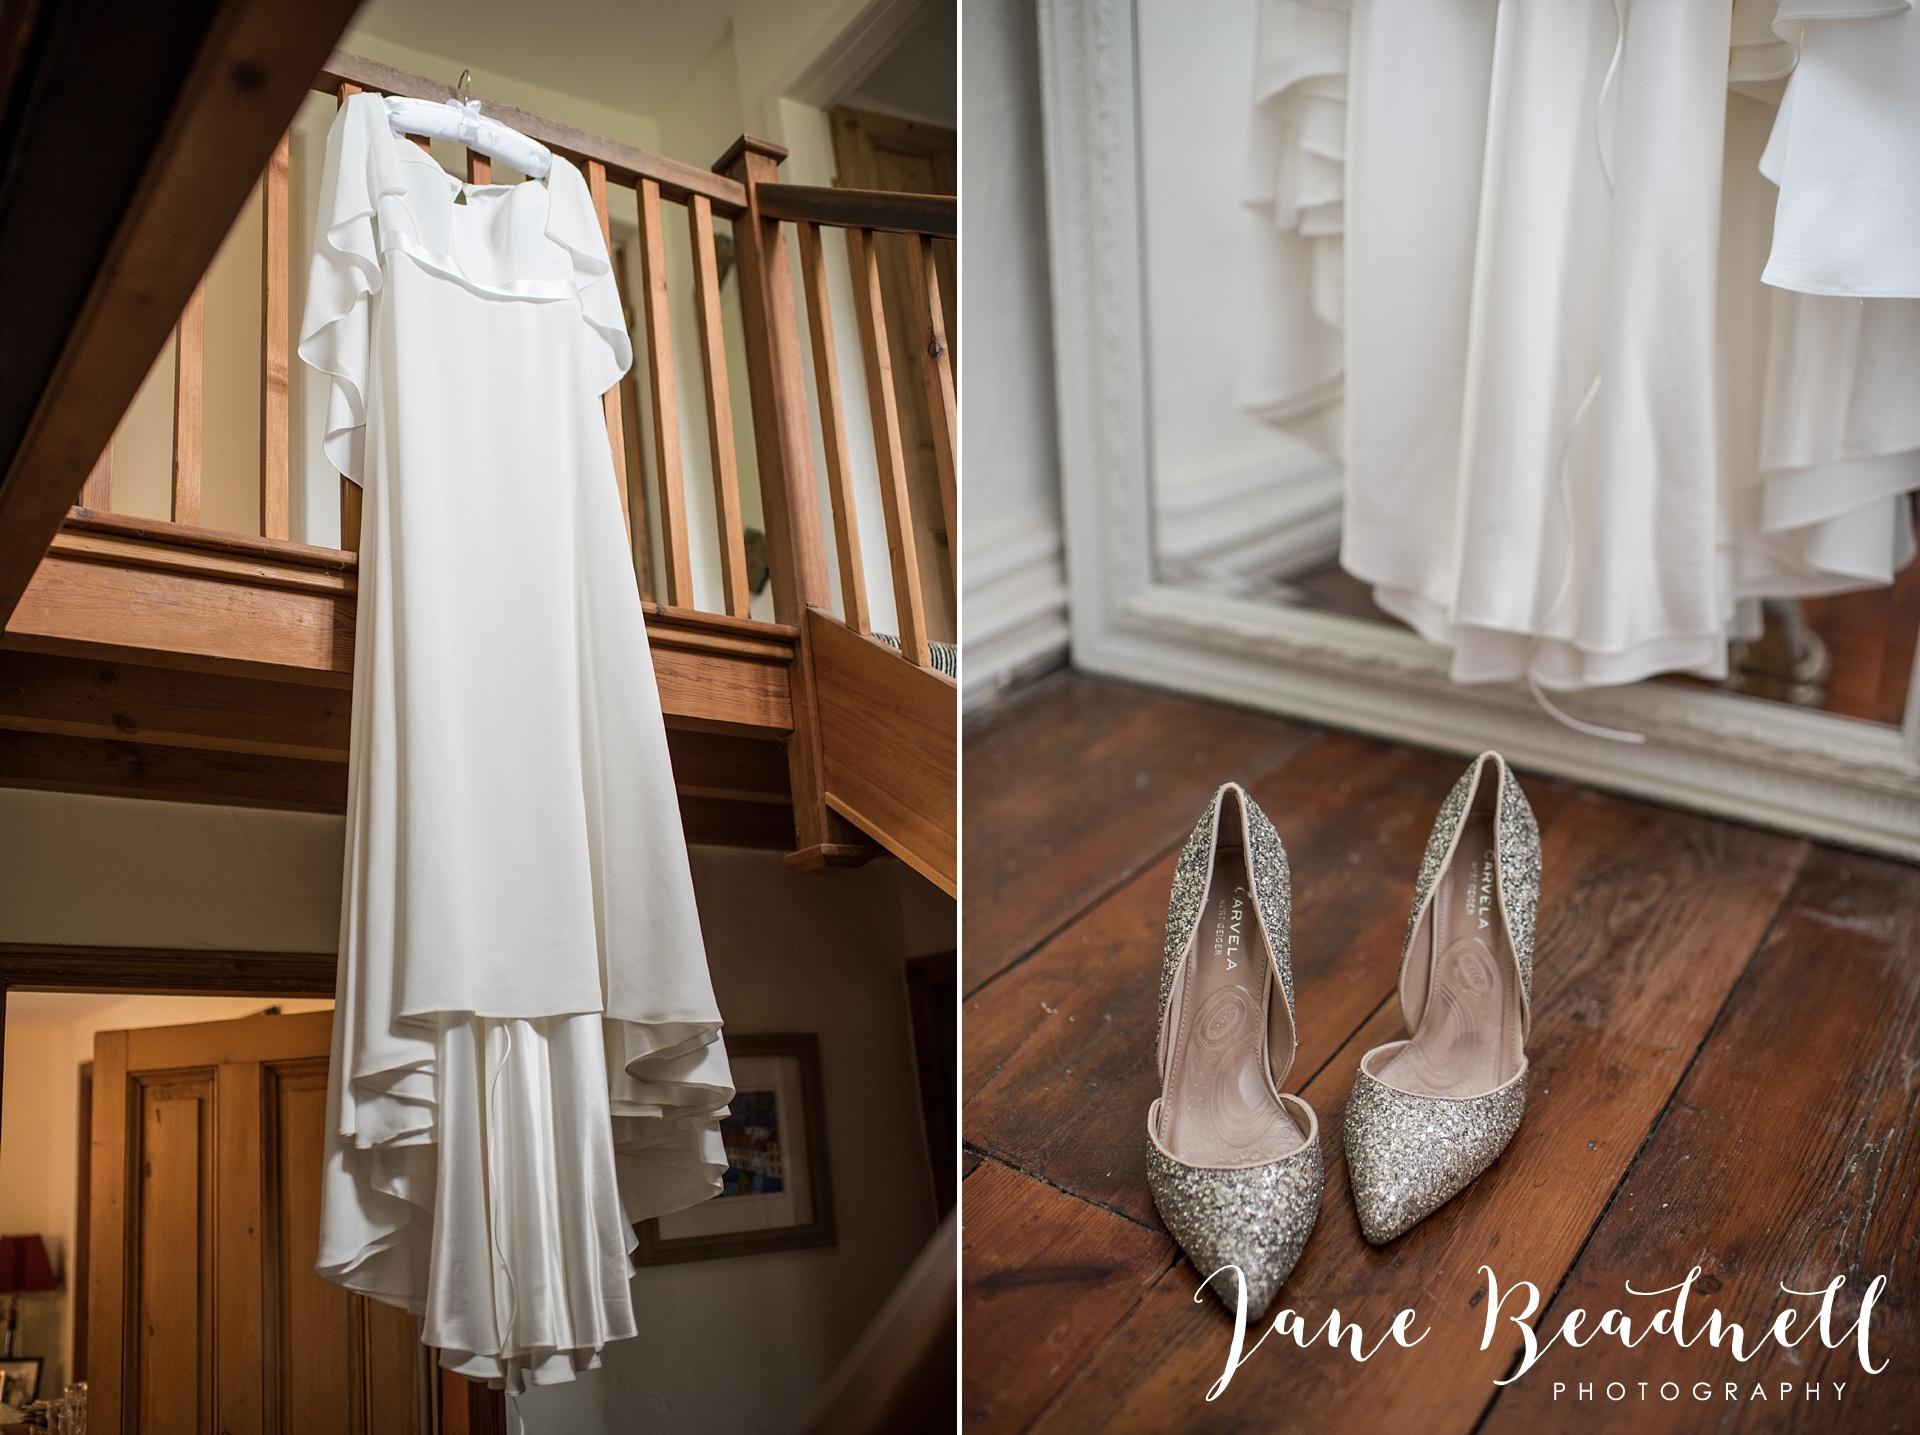 fine-art-wedding-photographer-jane-beadnell-yorkshire-wedding-photographer_0026